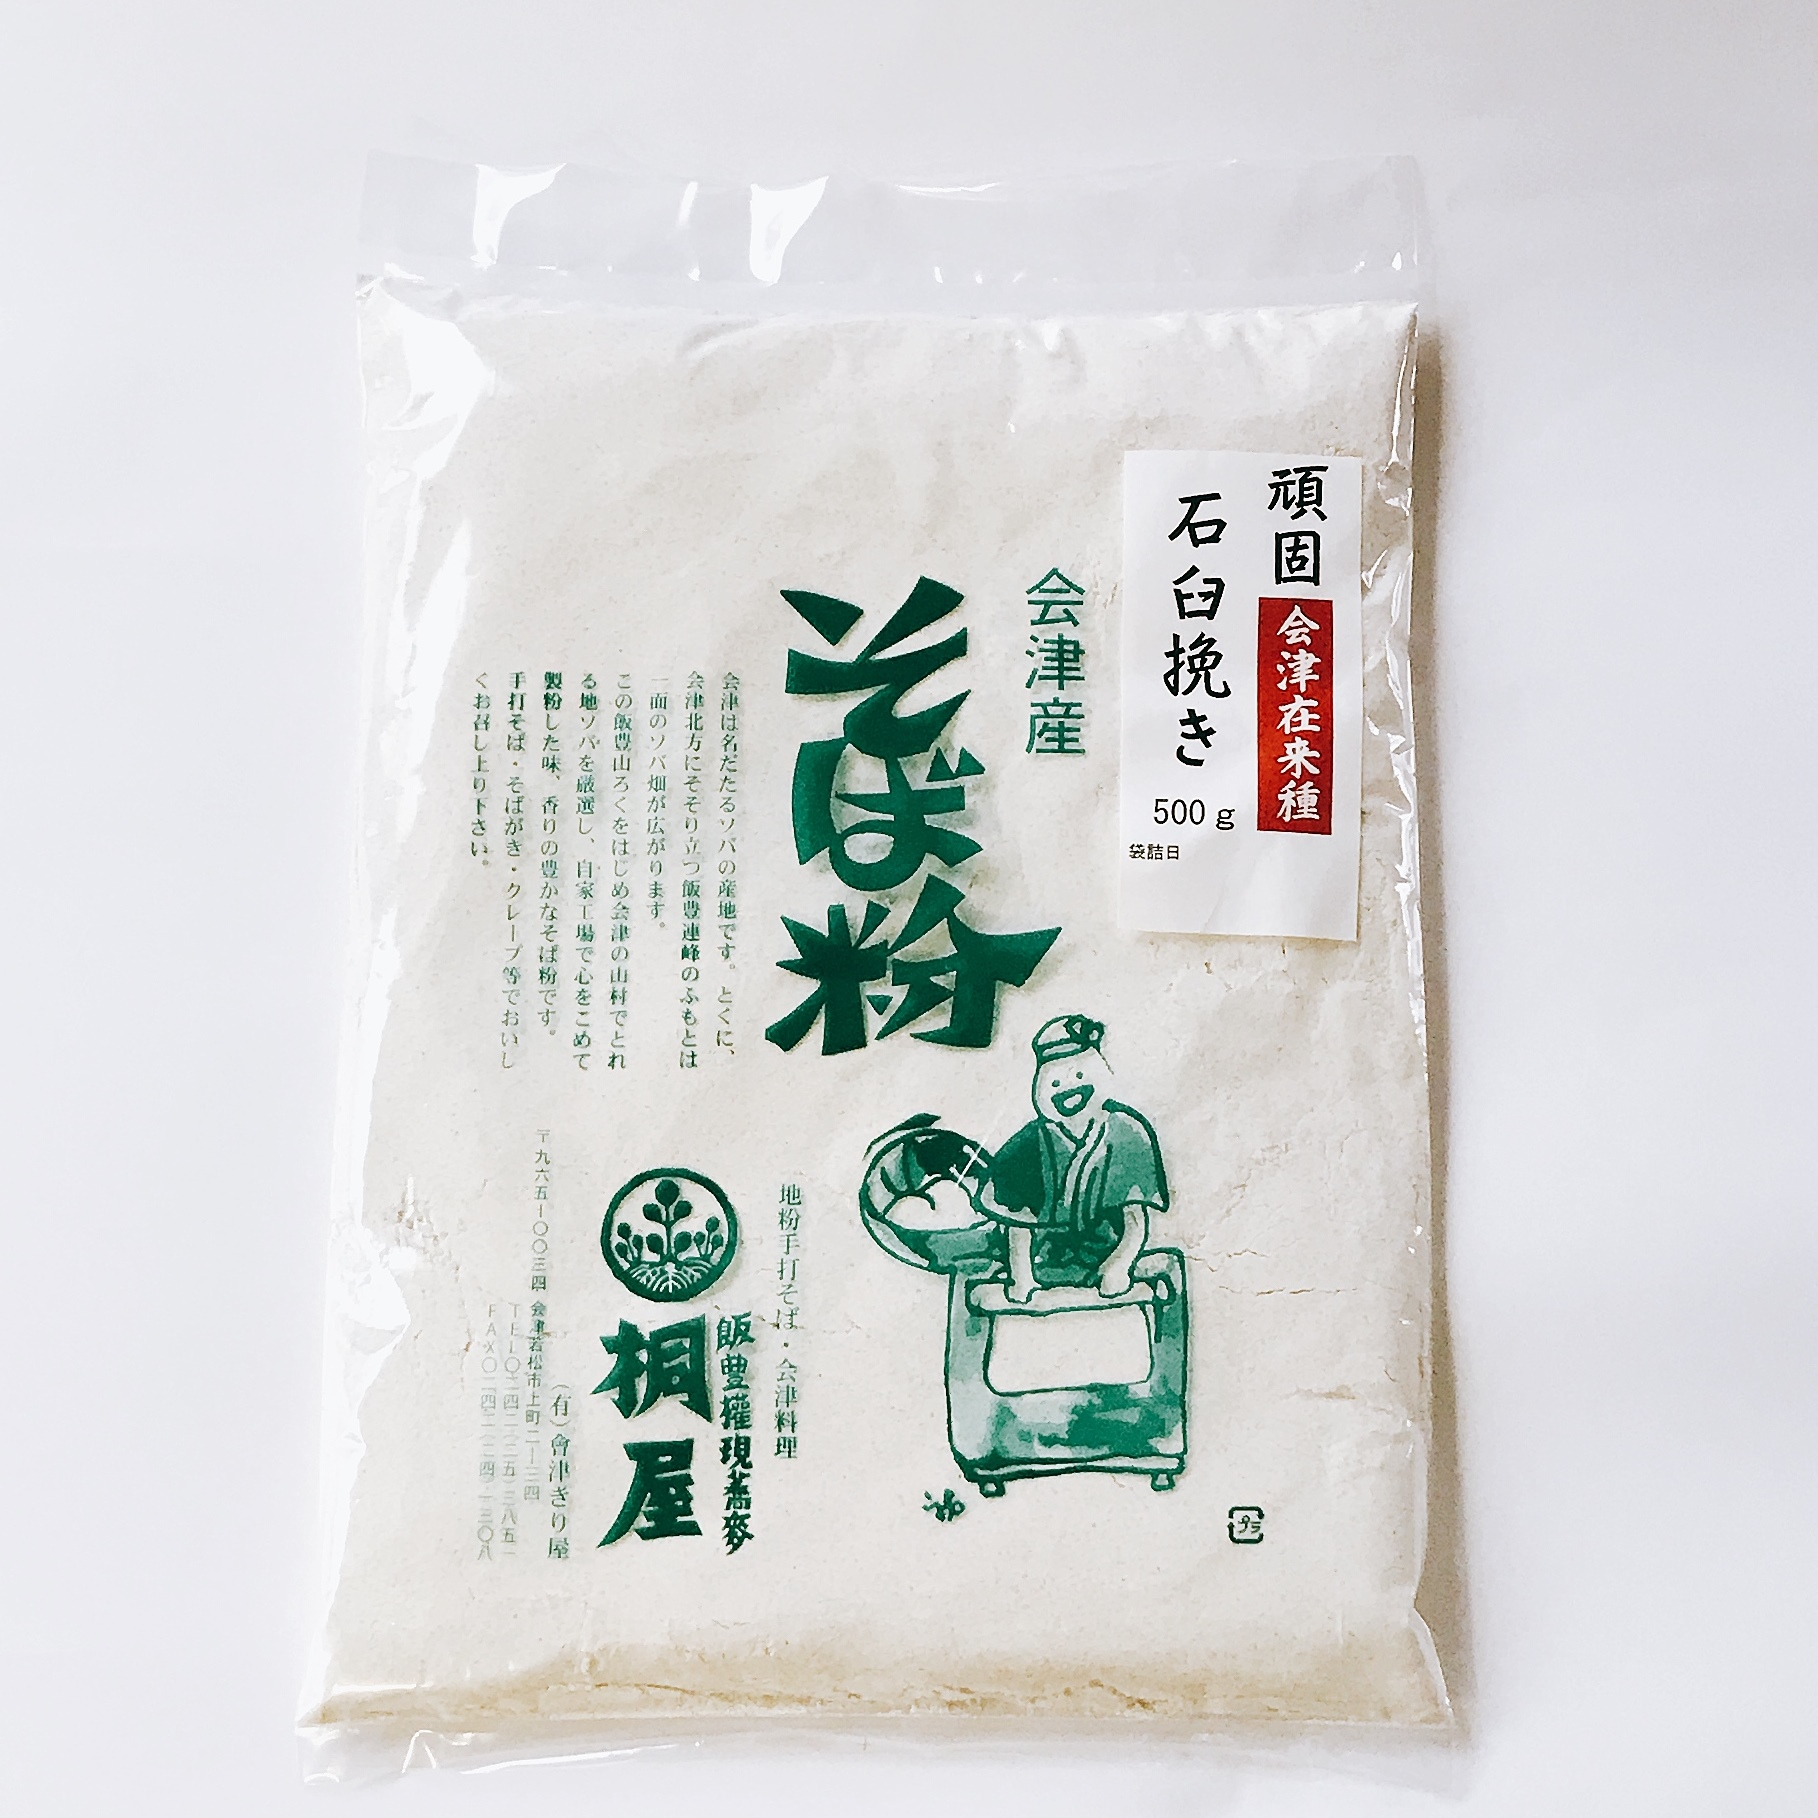 2019年産 会津在来 『頑固粉』 石臼挽き 500g画像